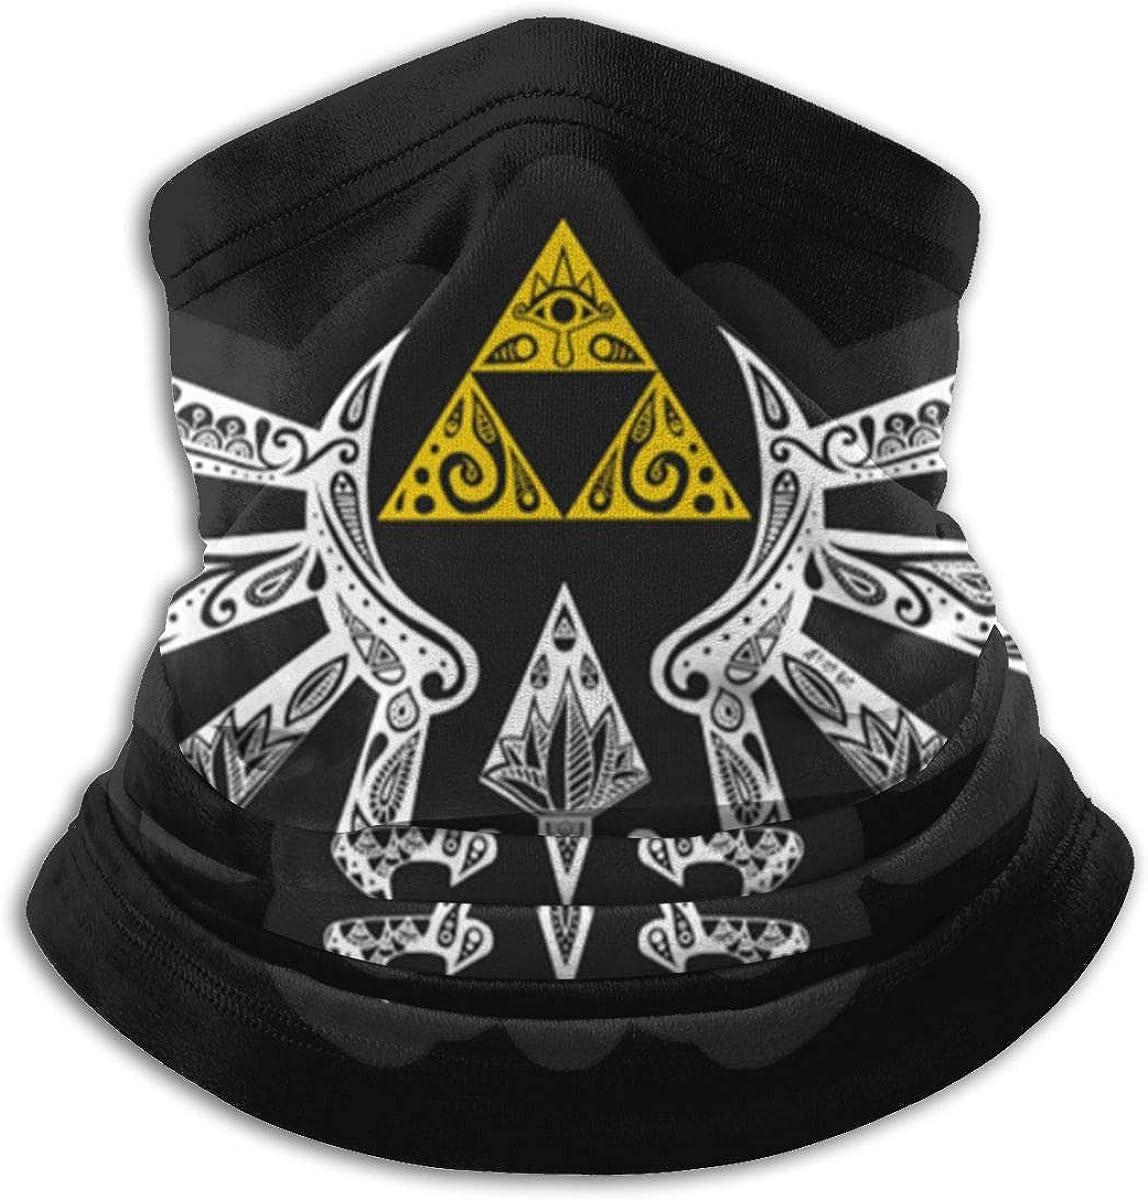 The Legend of Zelda Triforce Unisex Microfiber Neck Warmer Neck Gaiter Face Mask Bandana Balaclava